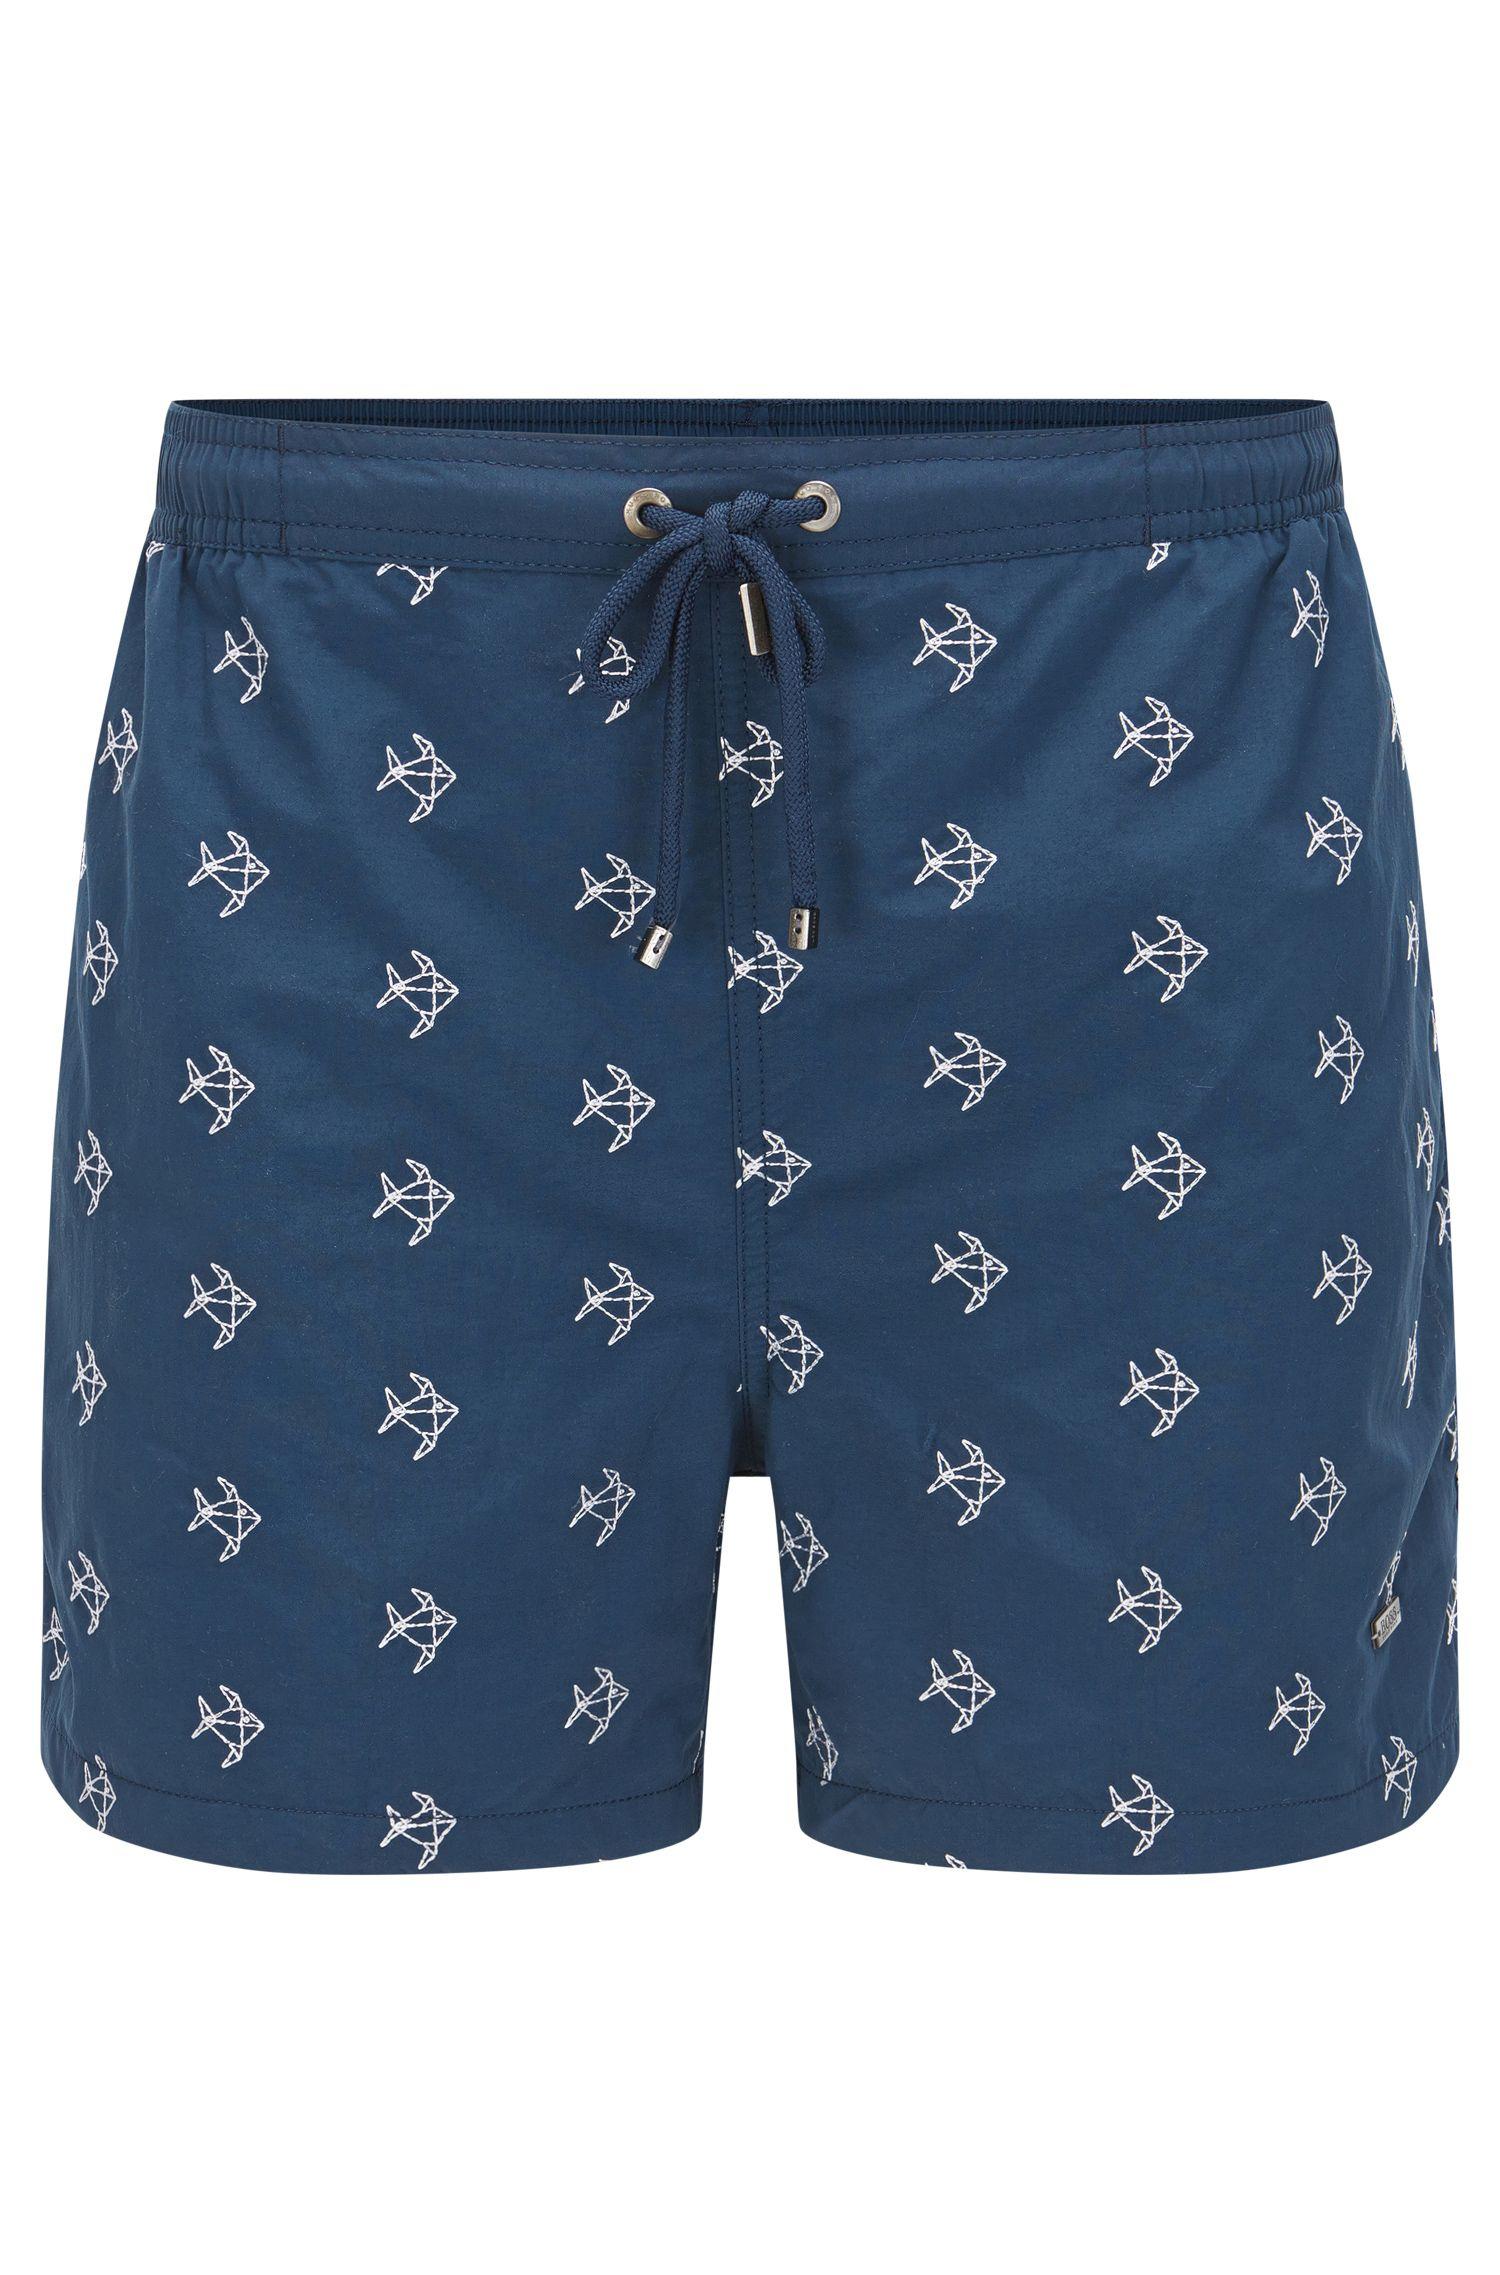 'White Shark'   Quick Dry Nylon Embroidered Swim Shorts